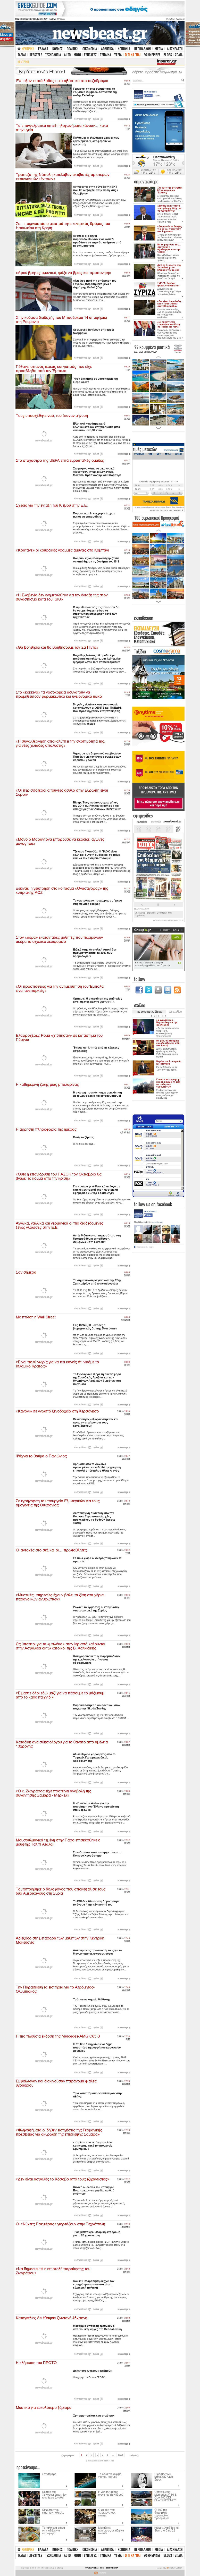 News Beast at Friday Sept. 26, 2014, 2:14 a.m. UTC